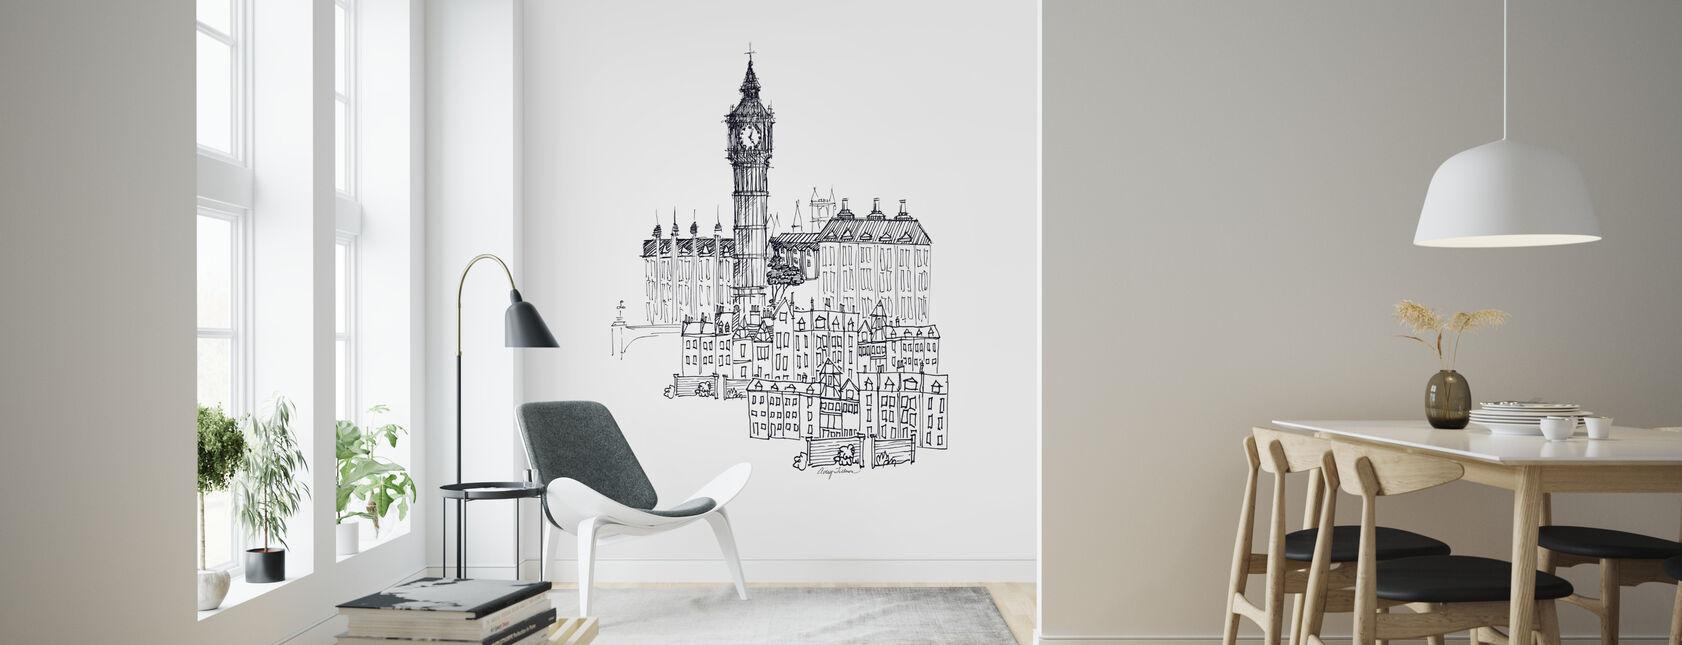 Avery Tillmon - Big Ben - Wallpaper - Living Room